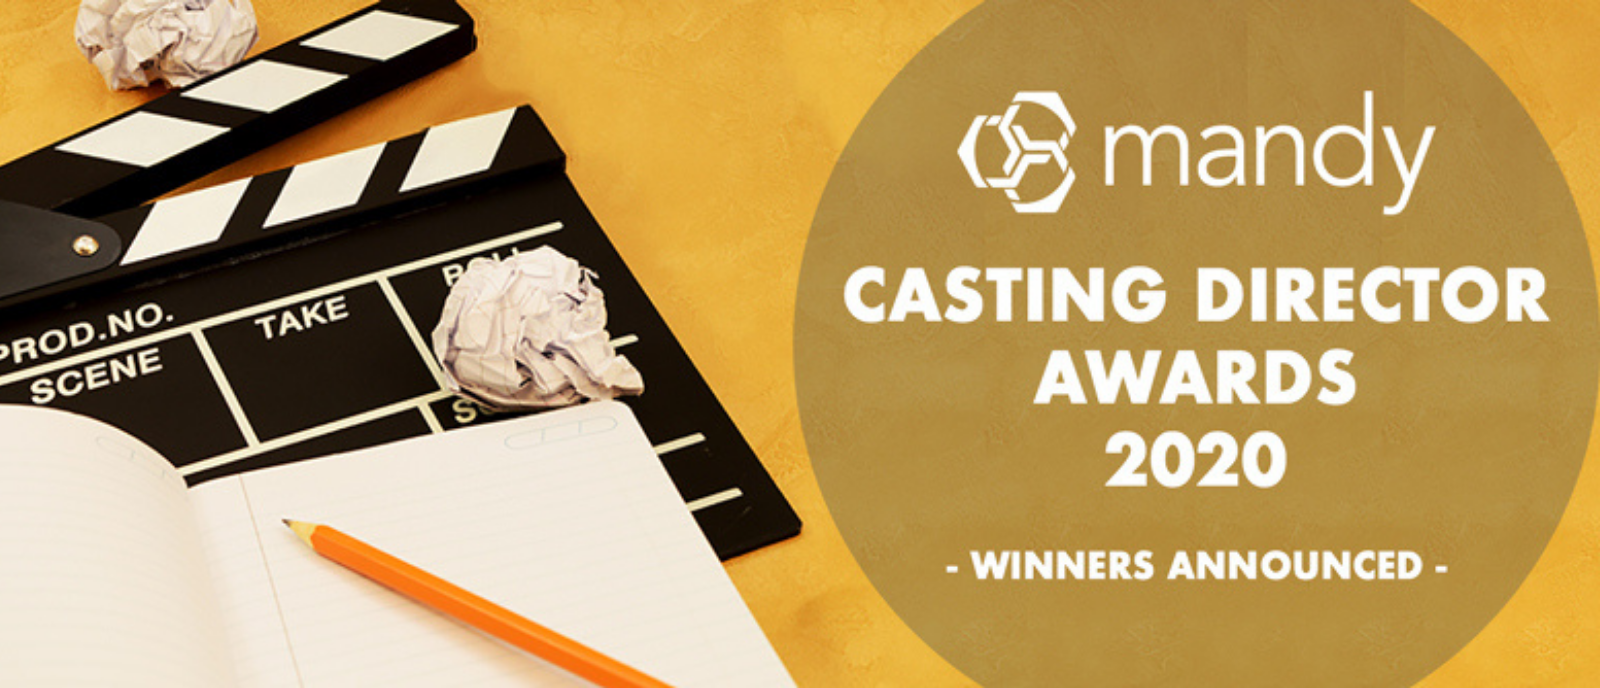 Mandy Casting Director Awards 2020